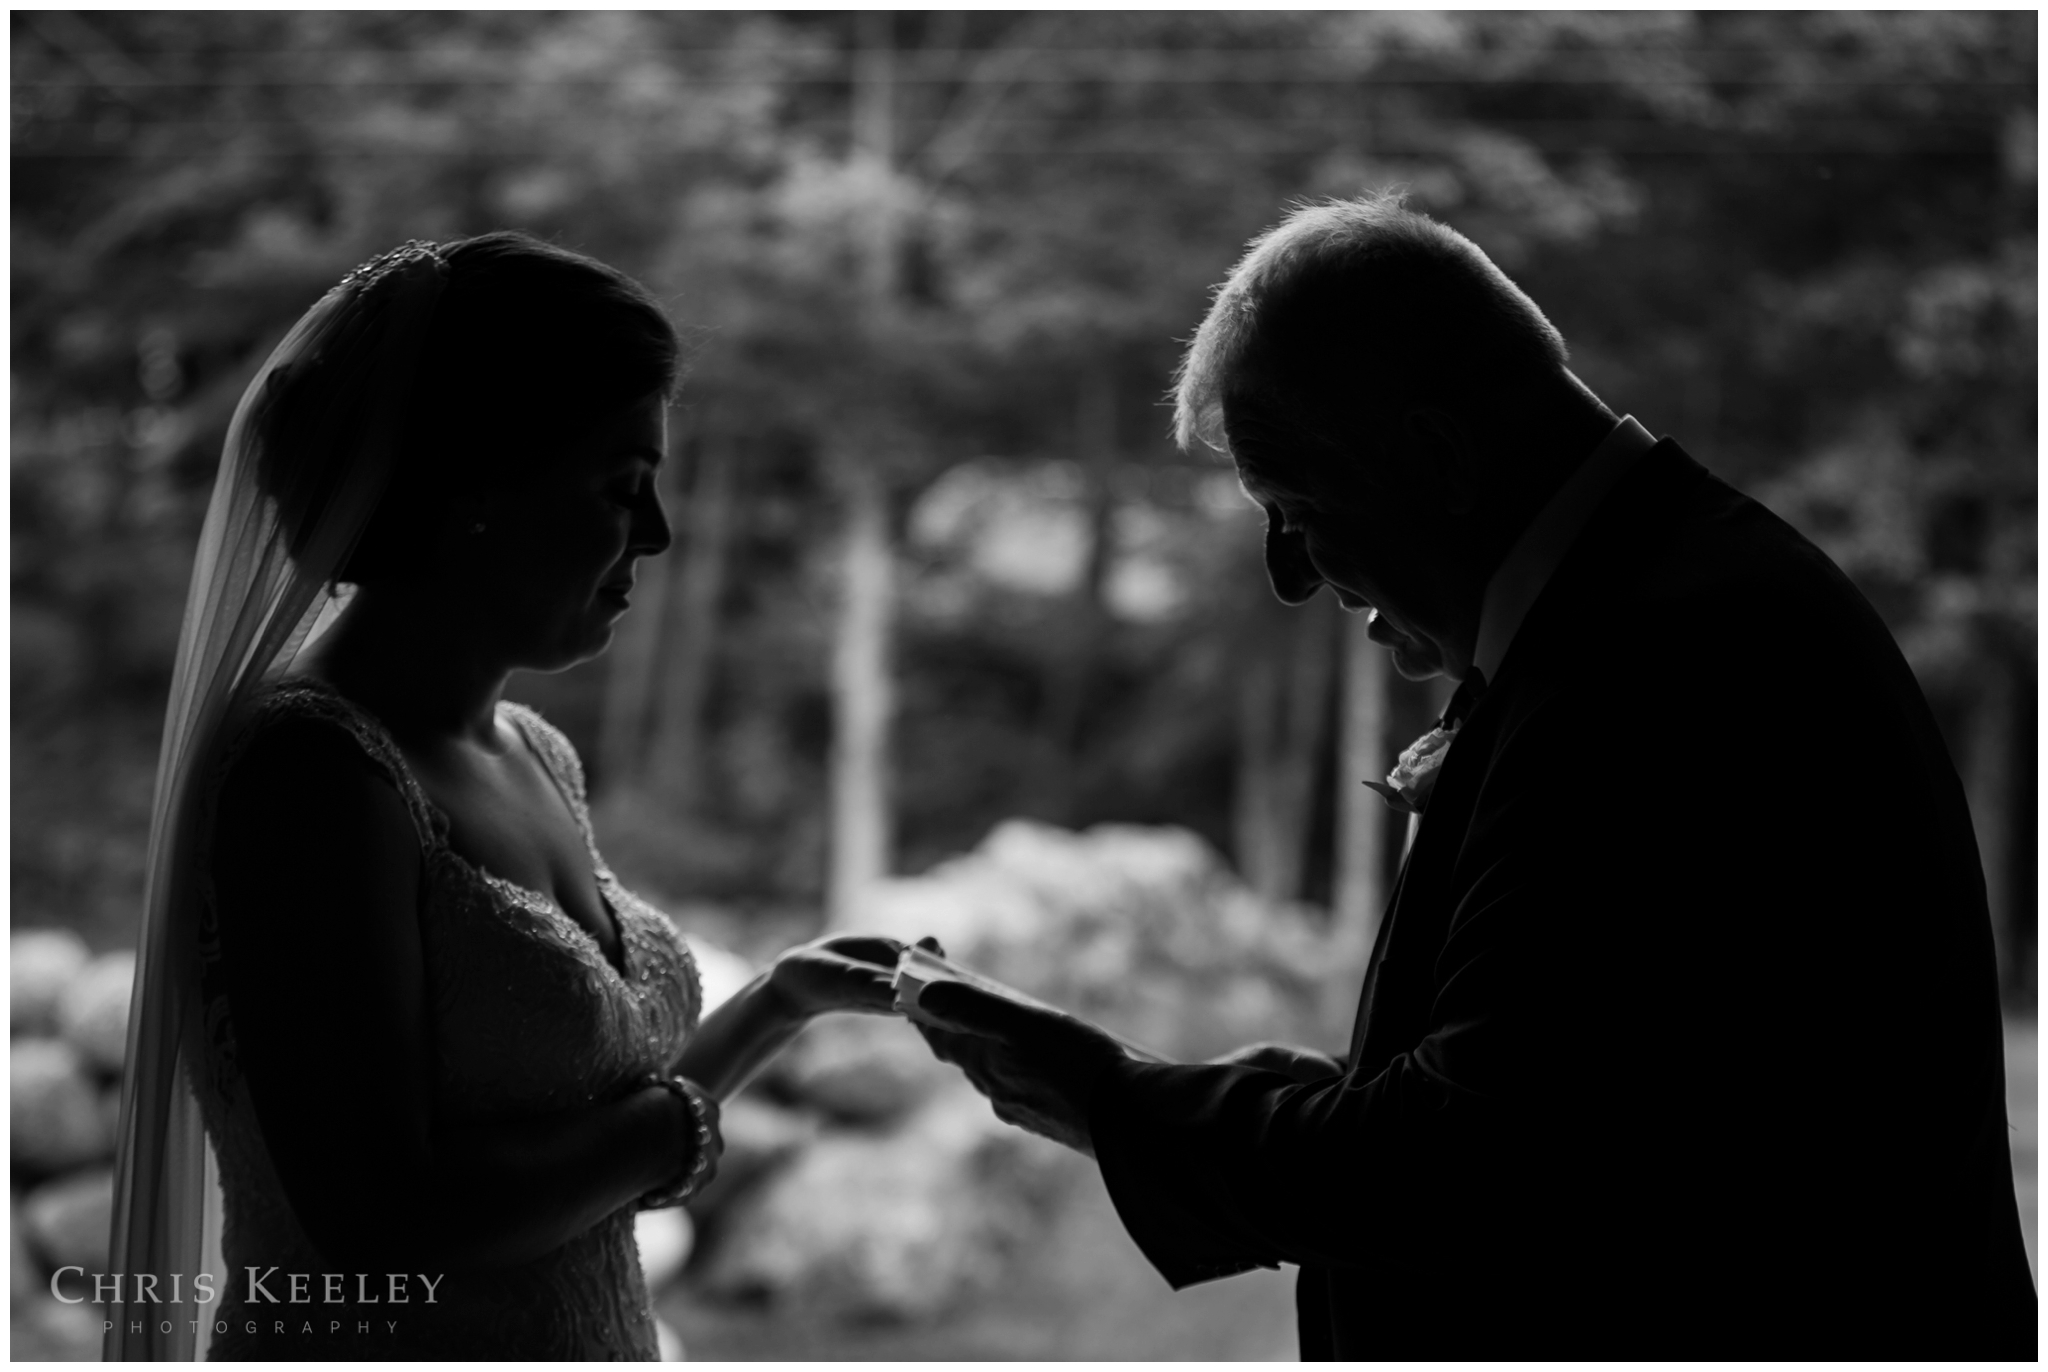 burrows-new-hampshire-wedding-photographer-chris-keeley-17.jpg